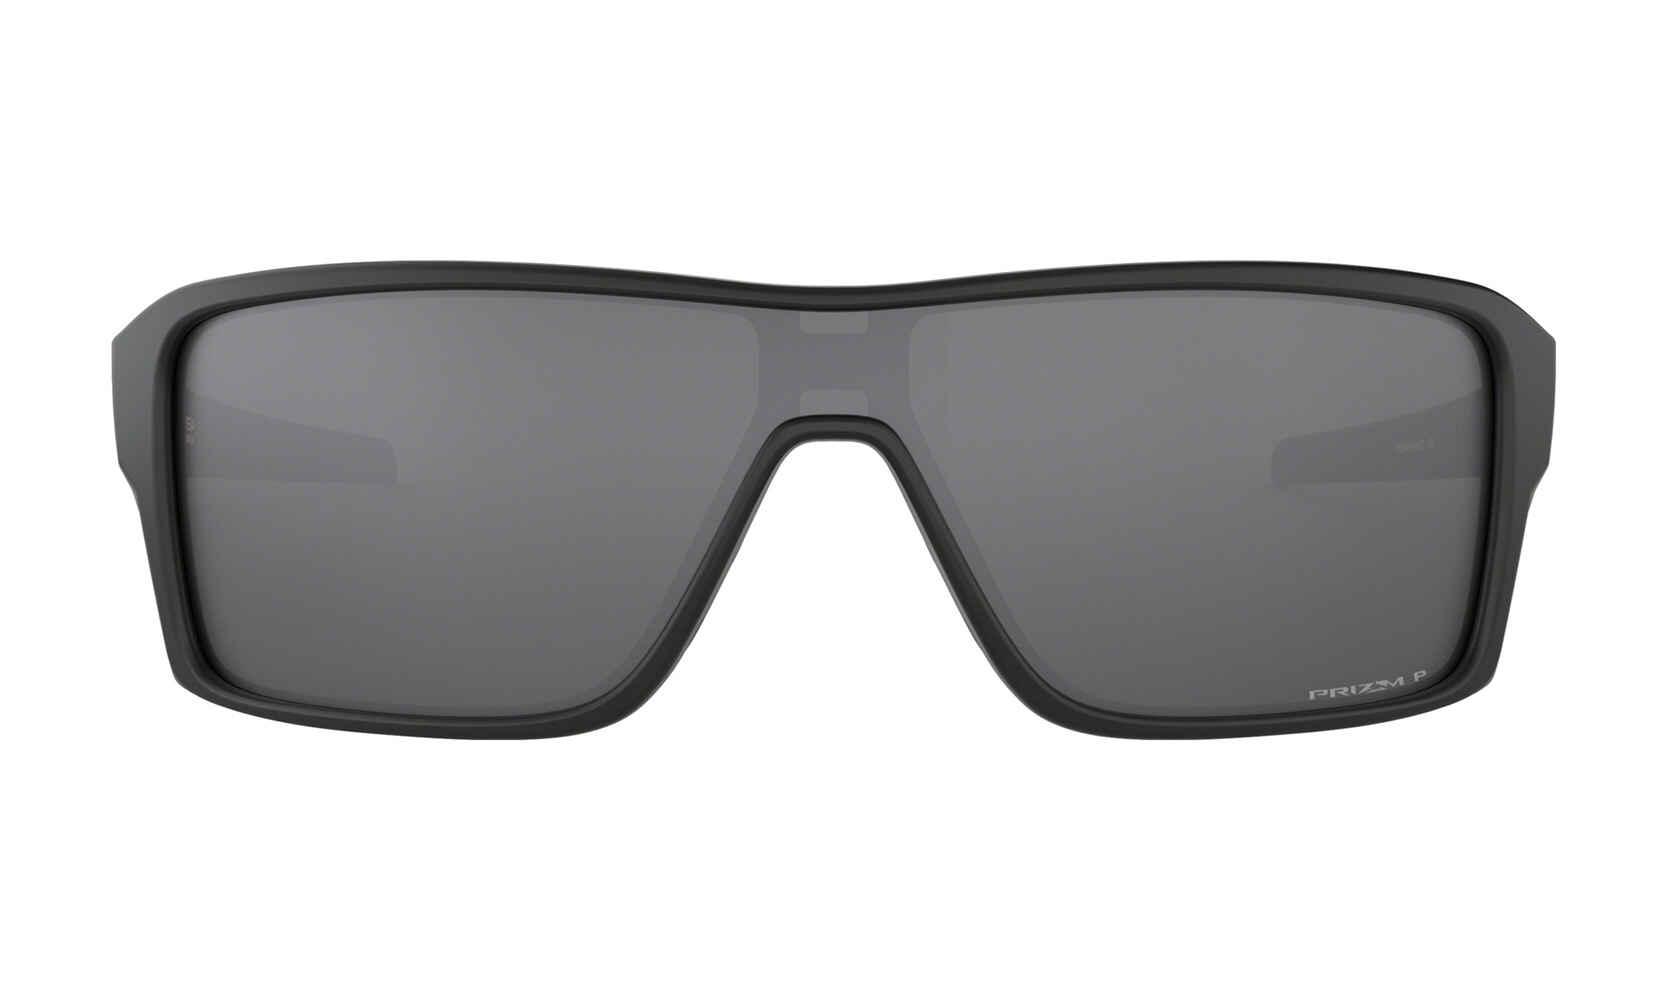 d7e360cc3d OAKLEY RIDGELINE - MATTE BLACK   PRIZM BLACK POLARIZED - Mens ...